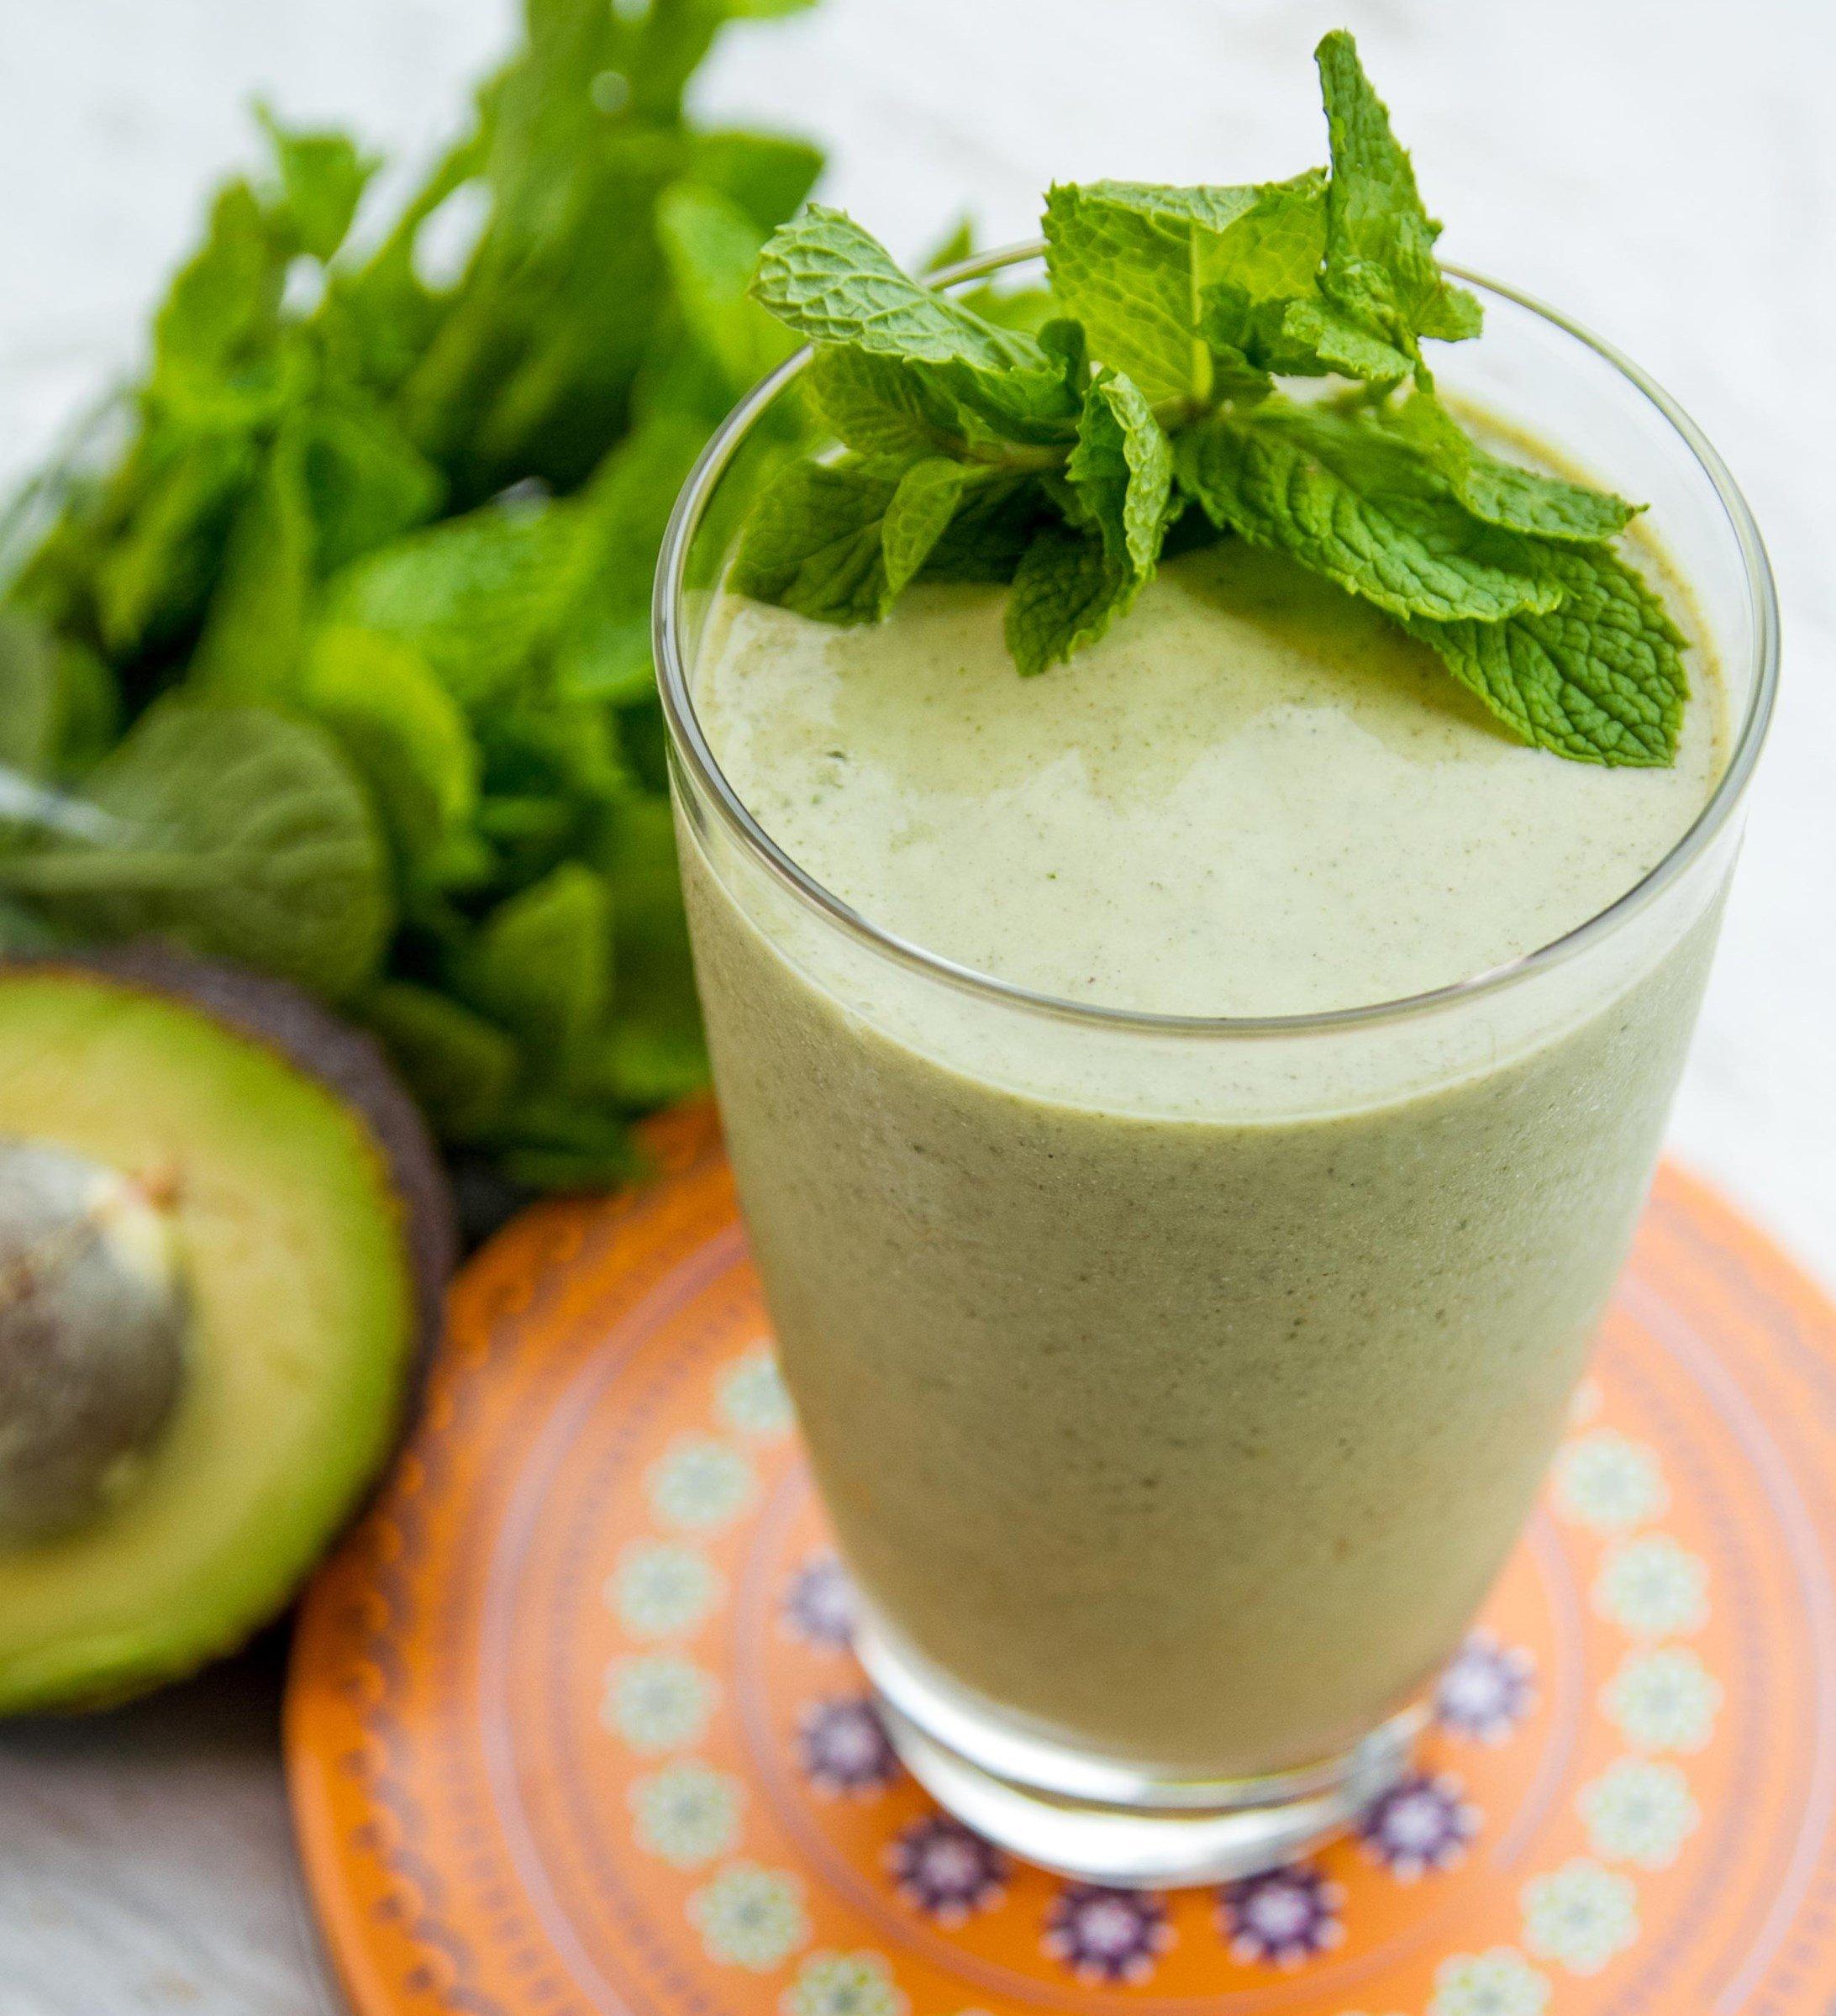 Morlife Alkalising Greens Lemon Lime Handy Pack 14 x 10g - 19 Super Greens, Fruits and Vegetables, Pre & Probiotics, Key Alkalising Minerals, Vegan Greens Powder, 14 Single Serves, LLHP